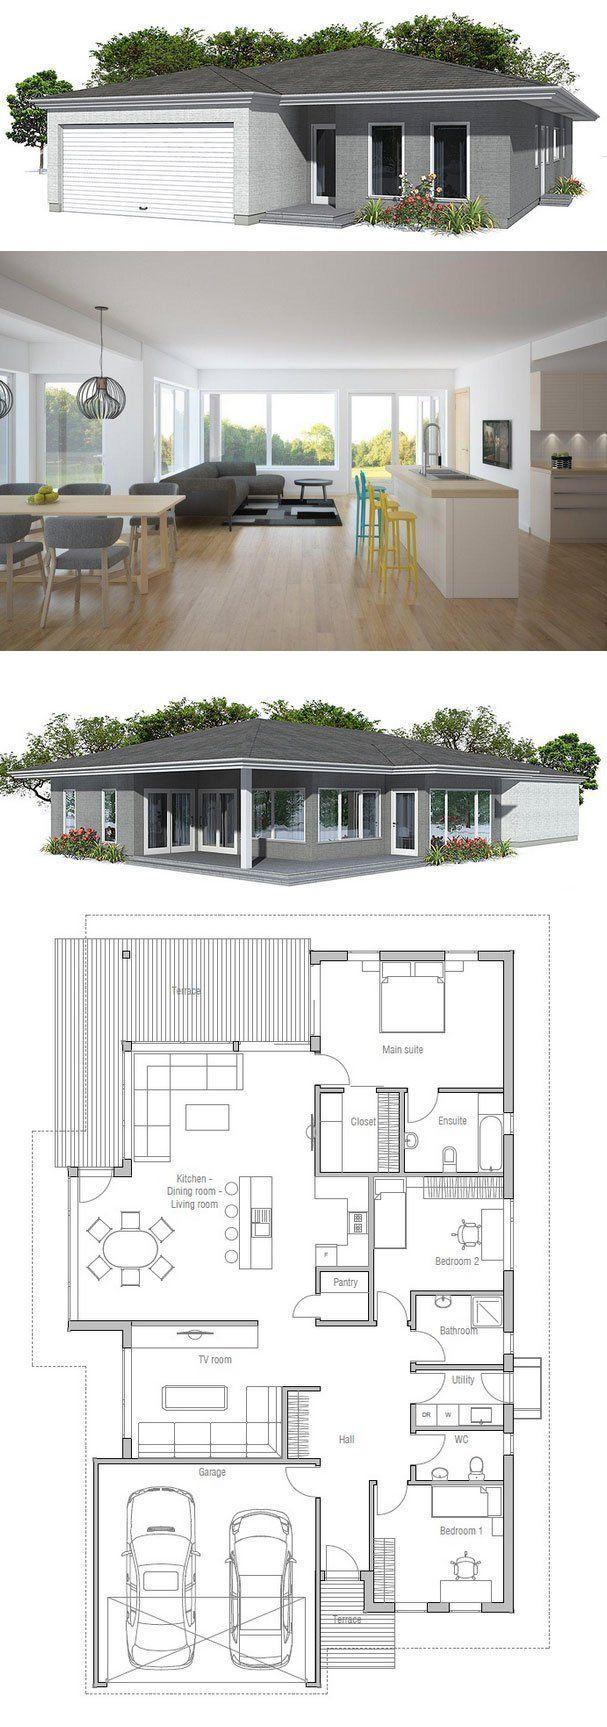 House Plan from ConceptHomecom con lavadero atras